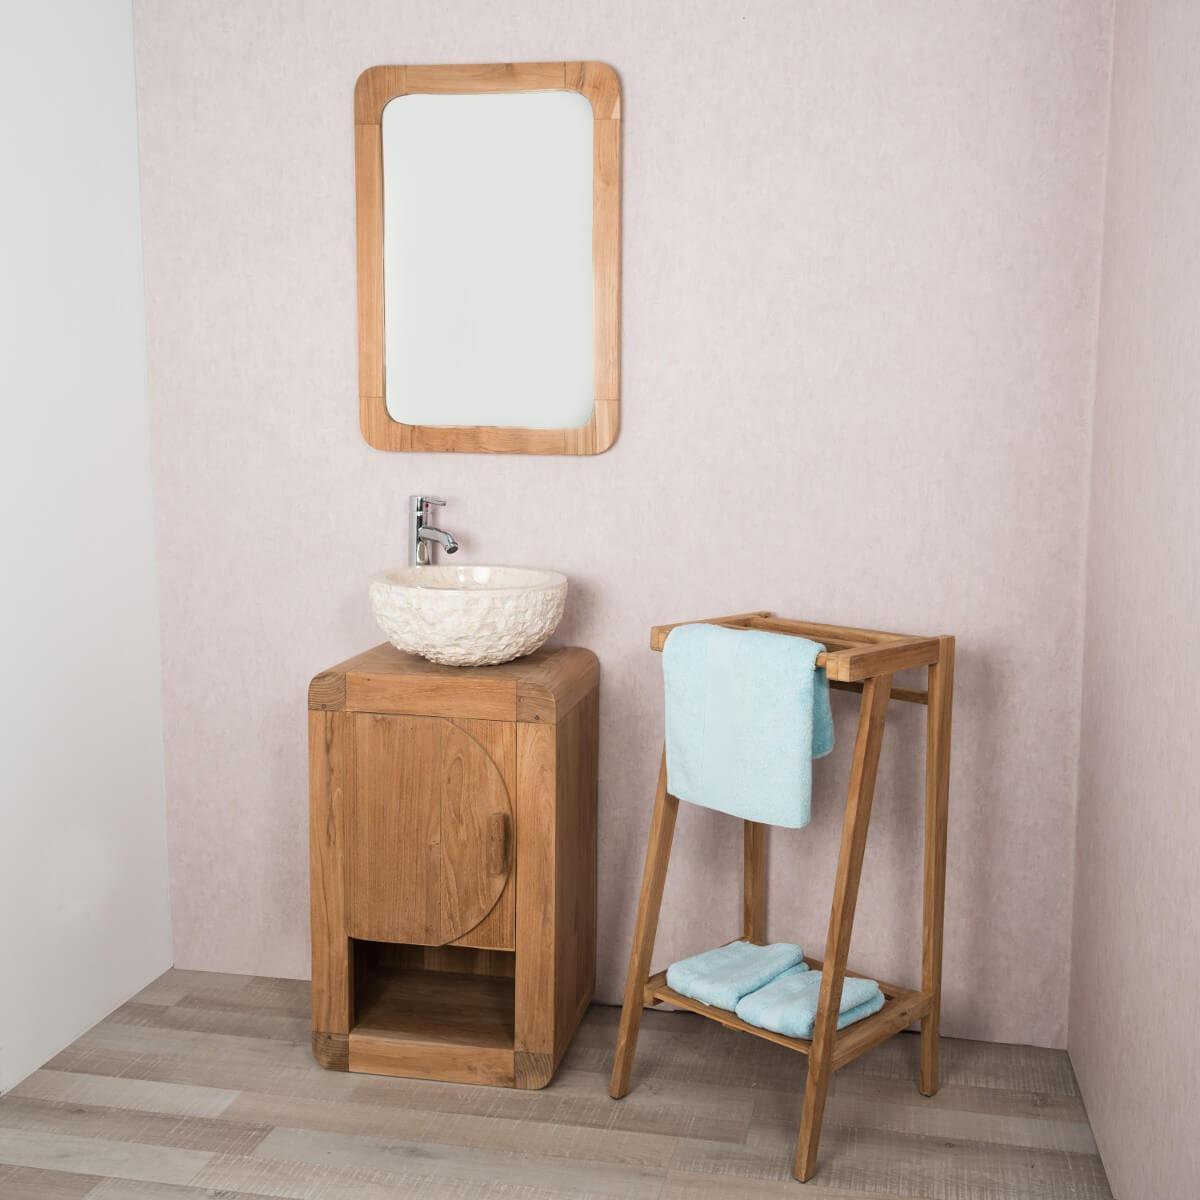 Gifi Petit Meuble Impressionnant Images Gifi Salle De Bain Best Petit Meuble Salle De Bains Maison Design